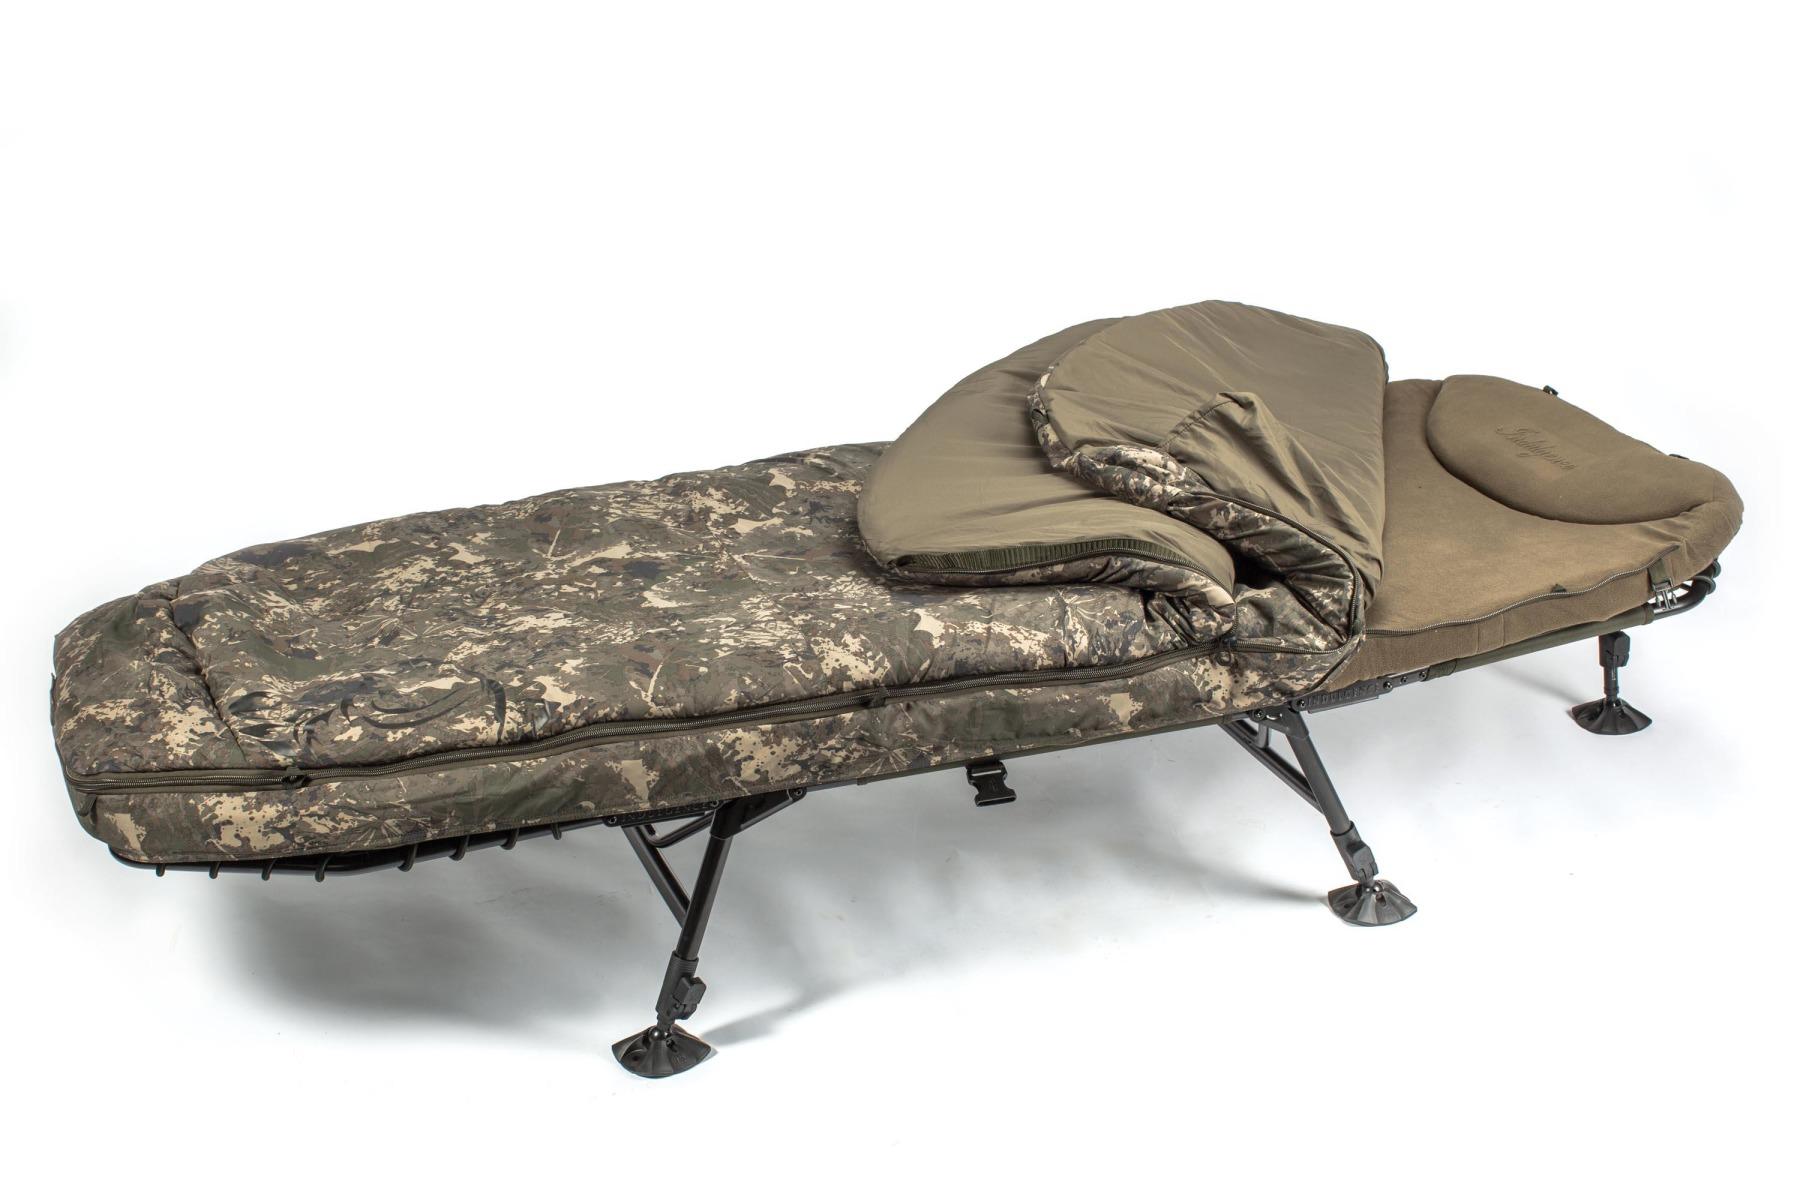 The MF60 models offer unrivalled comfort!